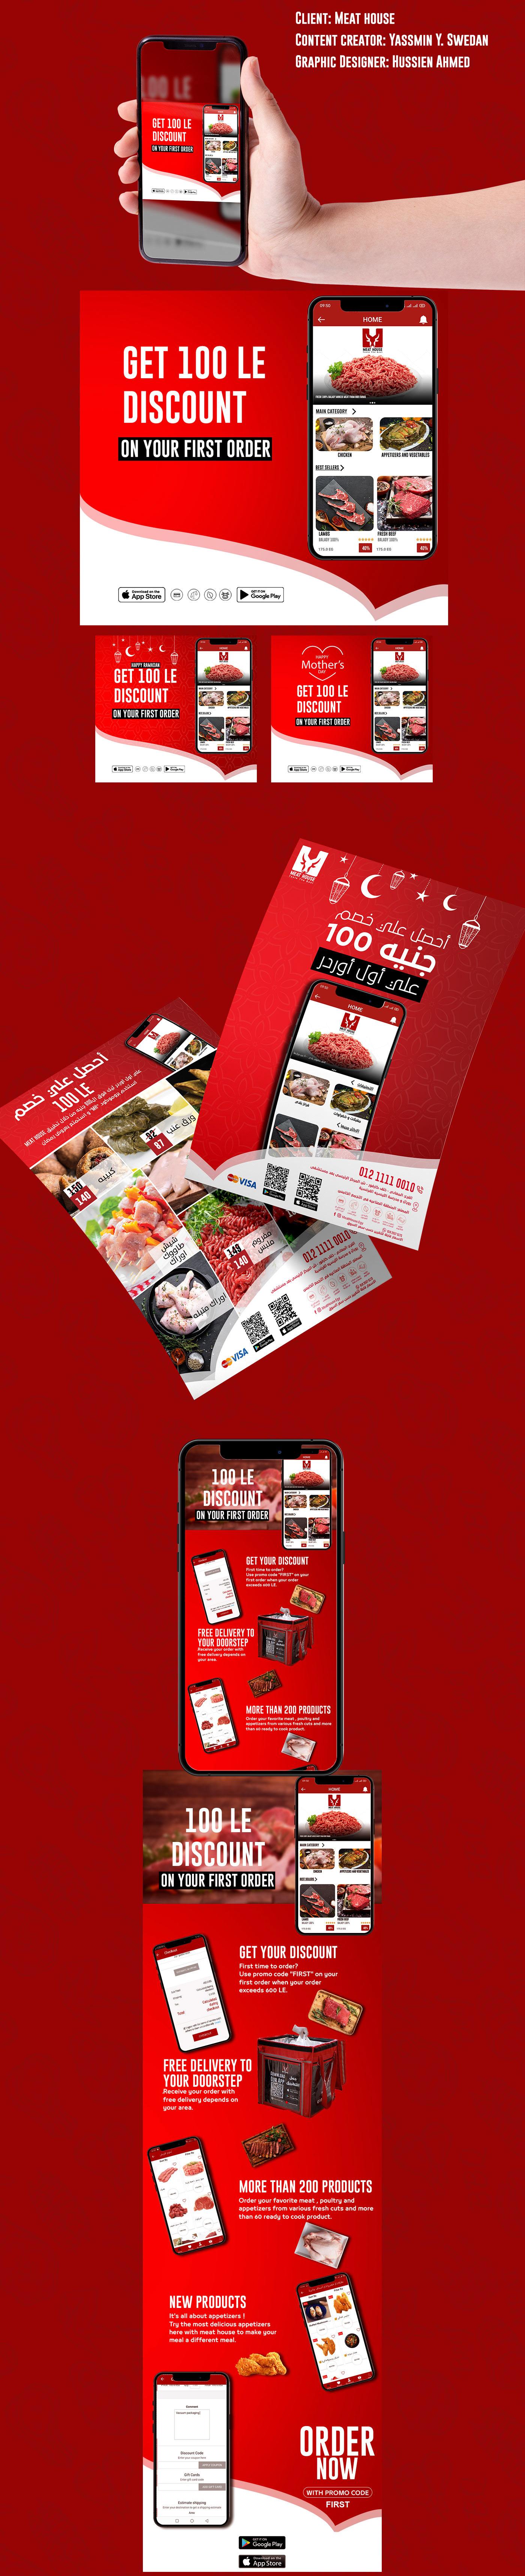 beef,burger,butcher,butchery,meat,meat house,social media,t-bone